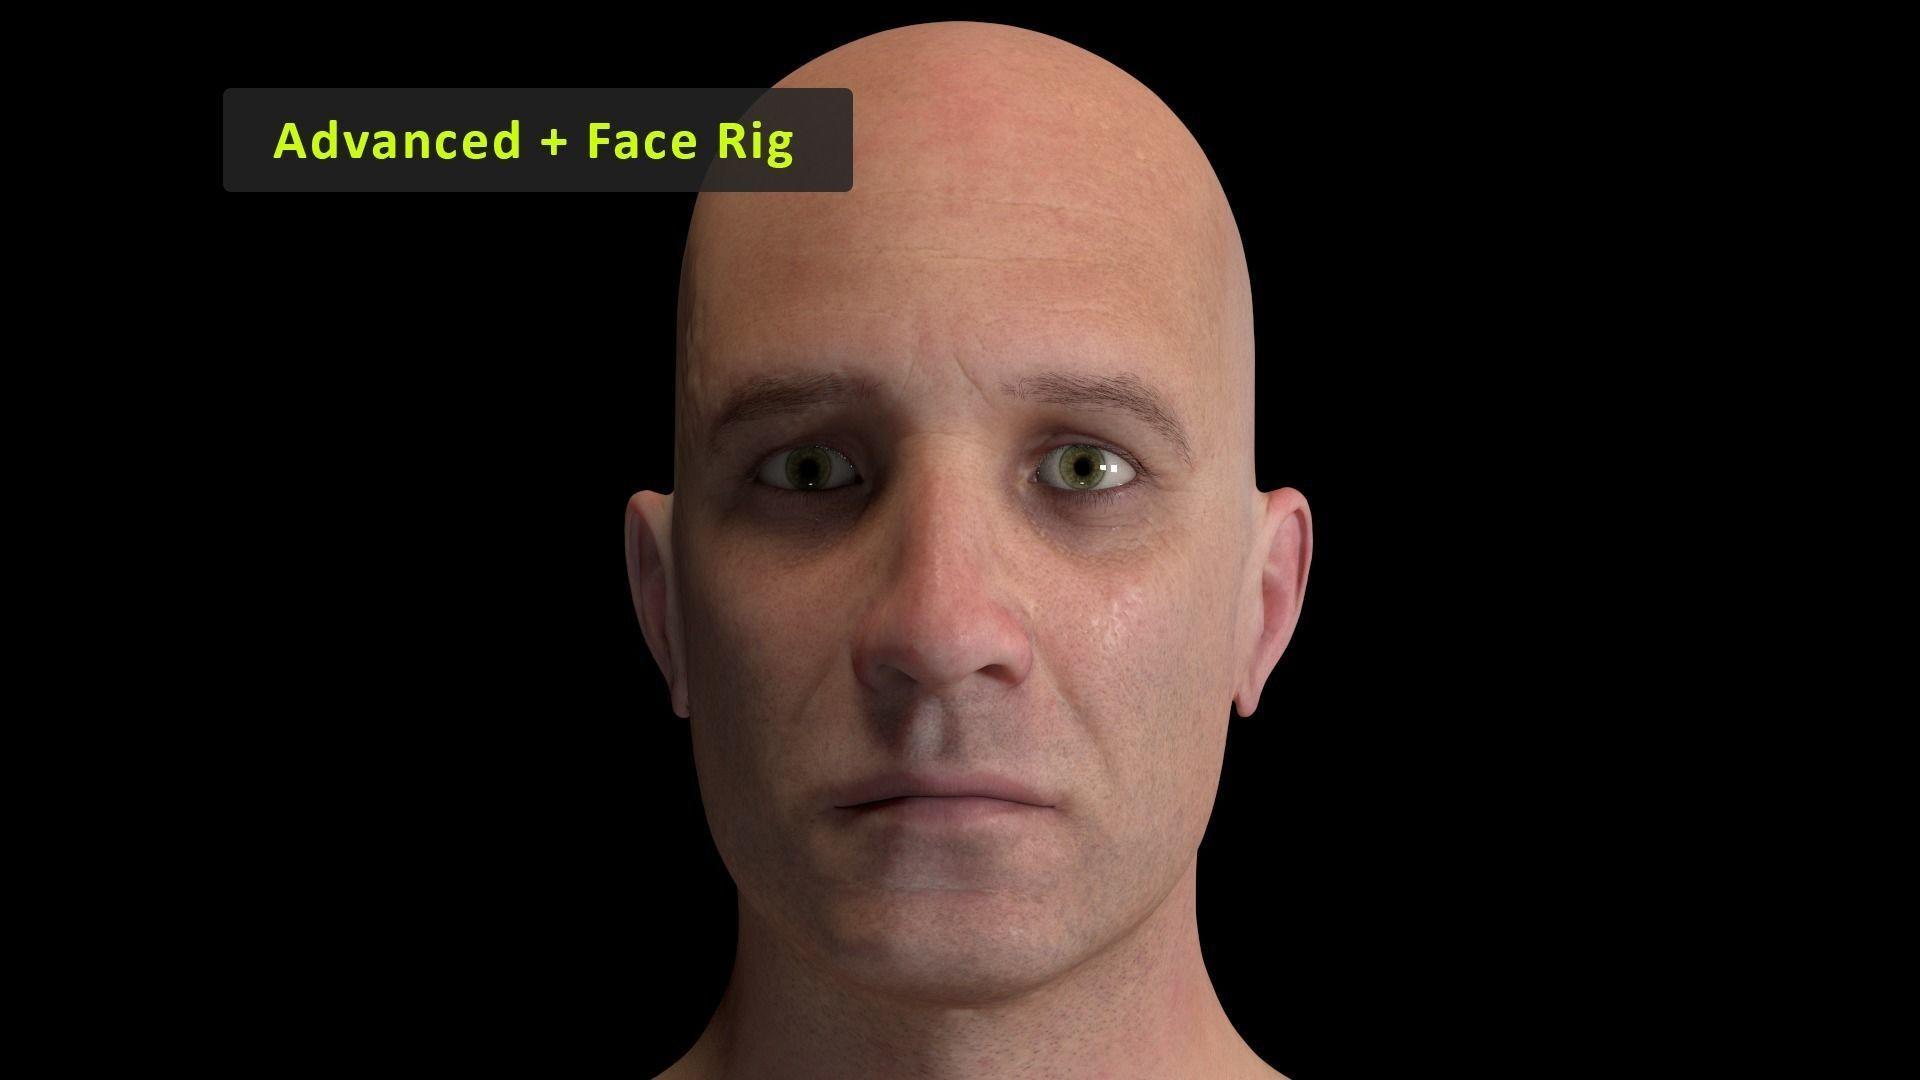 Cinematic Male 001 - Advanced Body - Face Rig - GUI